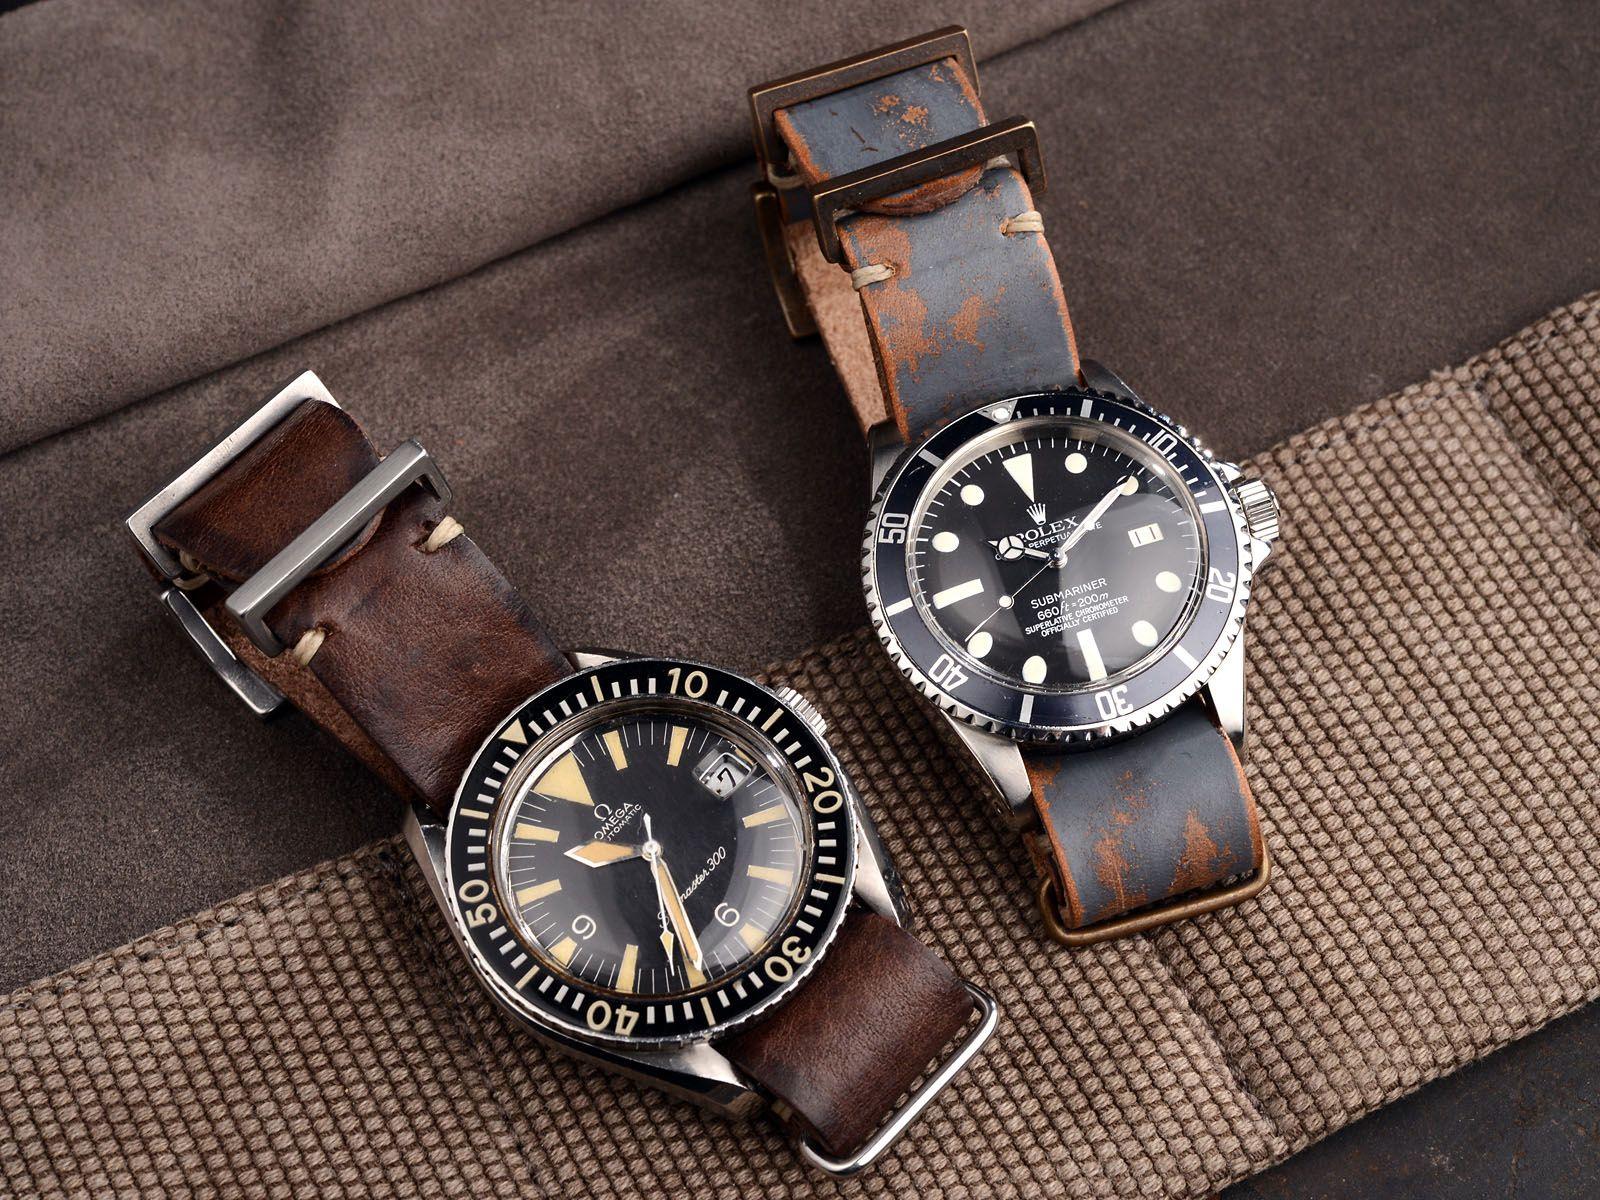 Bracelet cuir NATO pour Submariner gmt master explorer datejust 20 mm